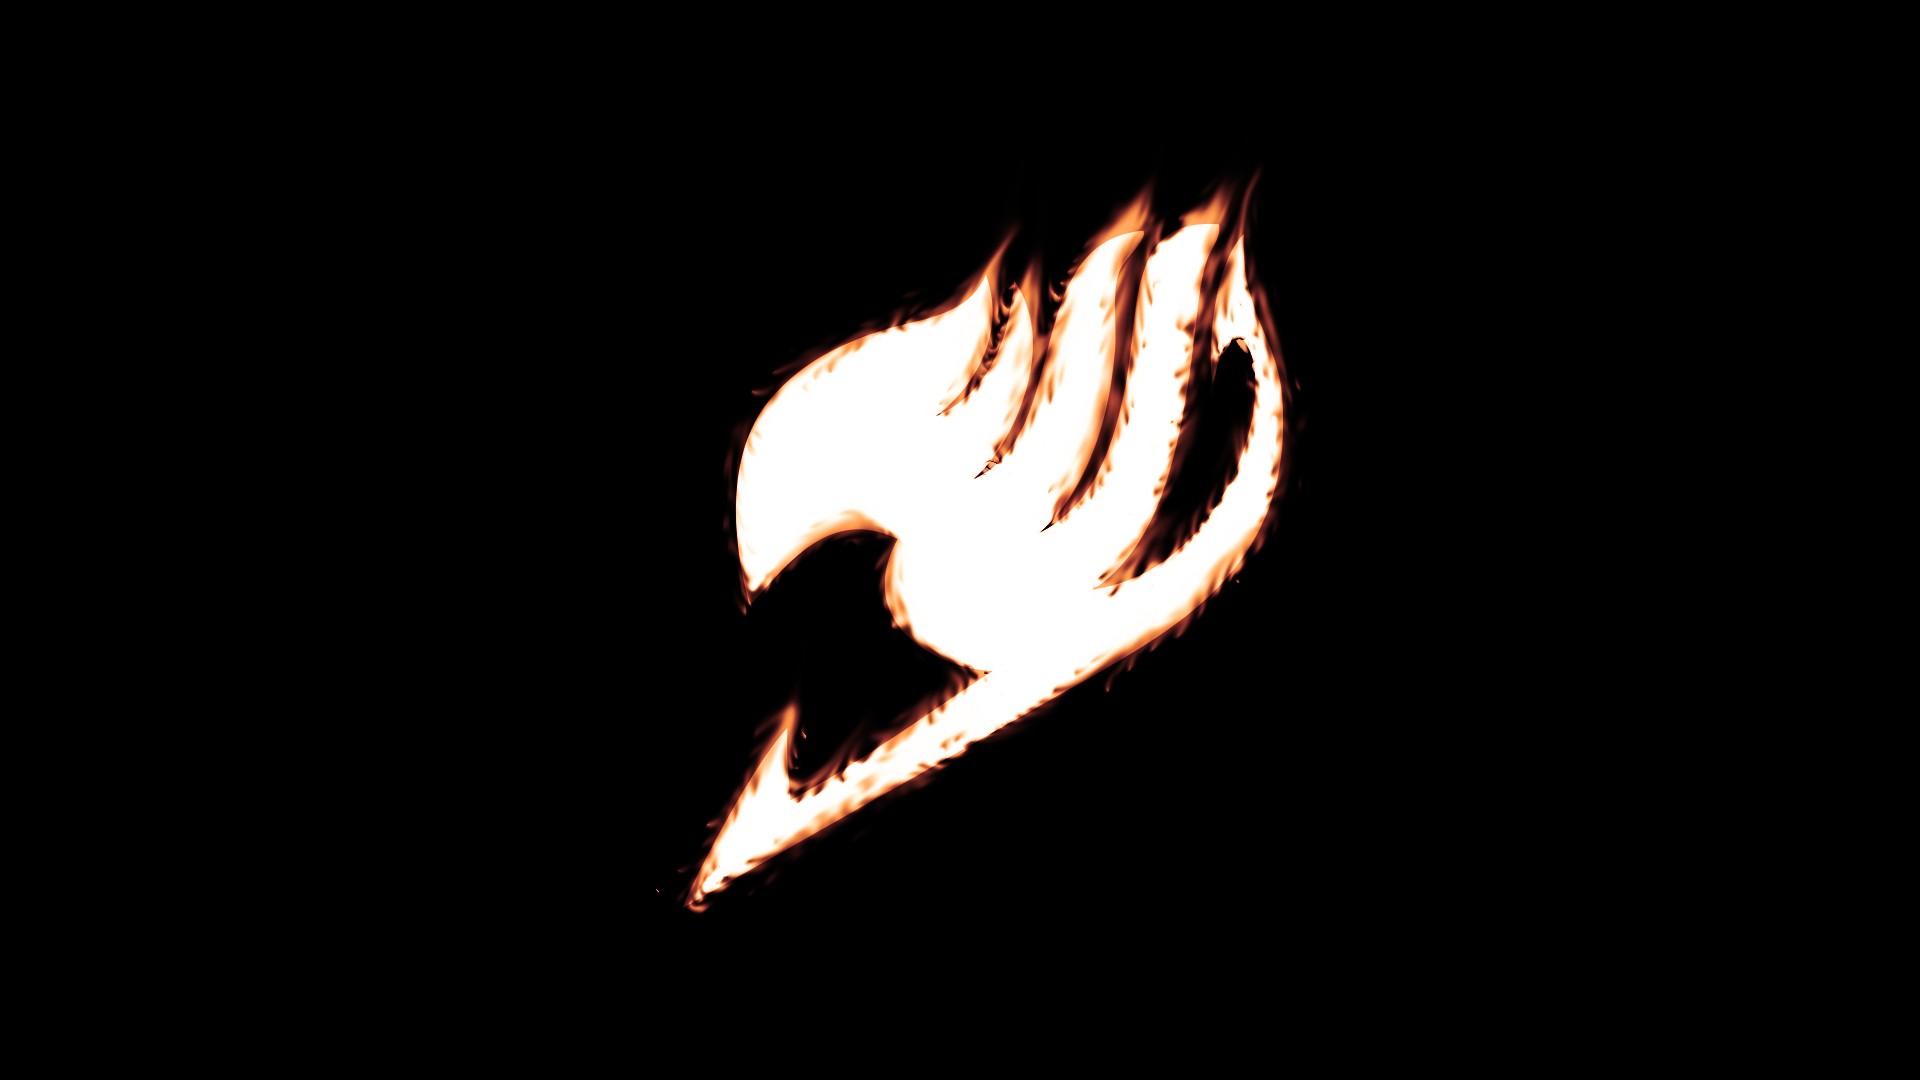 Akatsuki Hd Live Wallpaper Fairy Tail Logo Wallpaper Pixelstalk Net